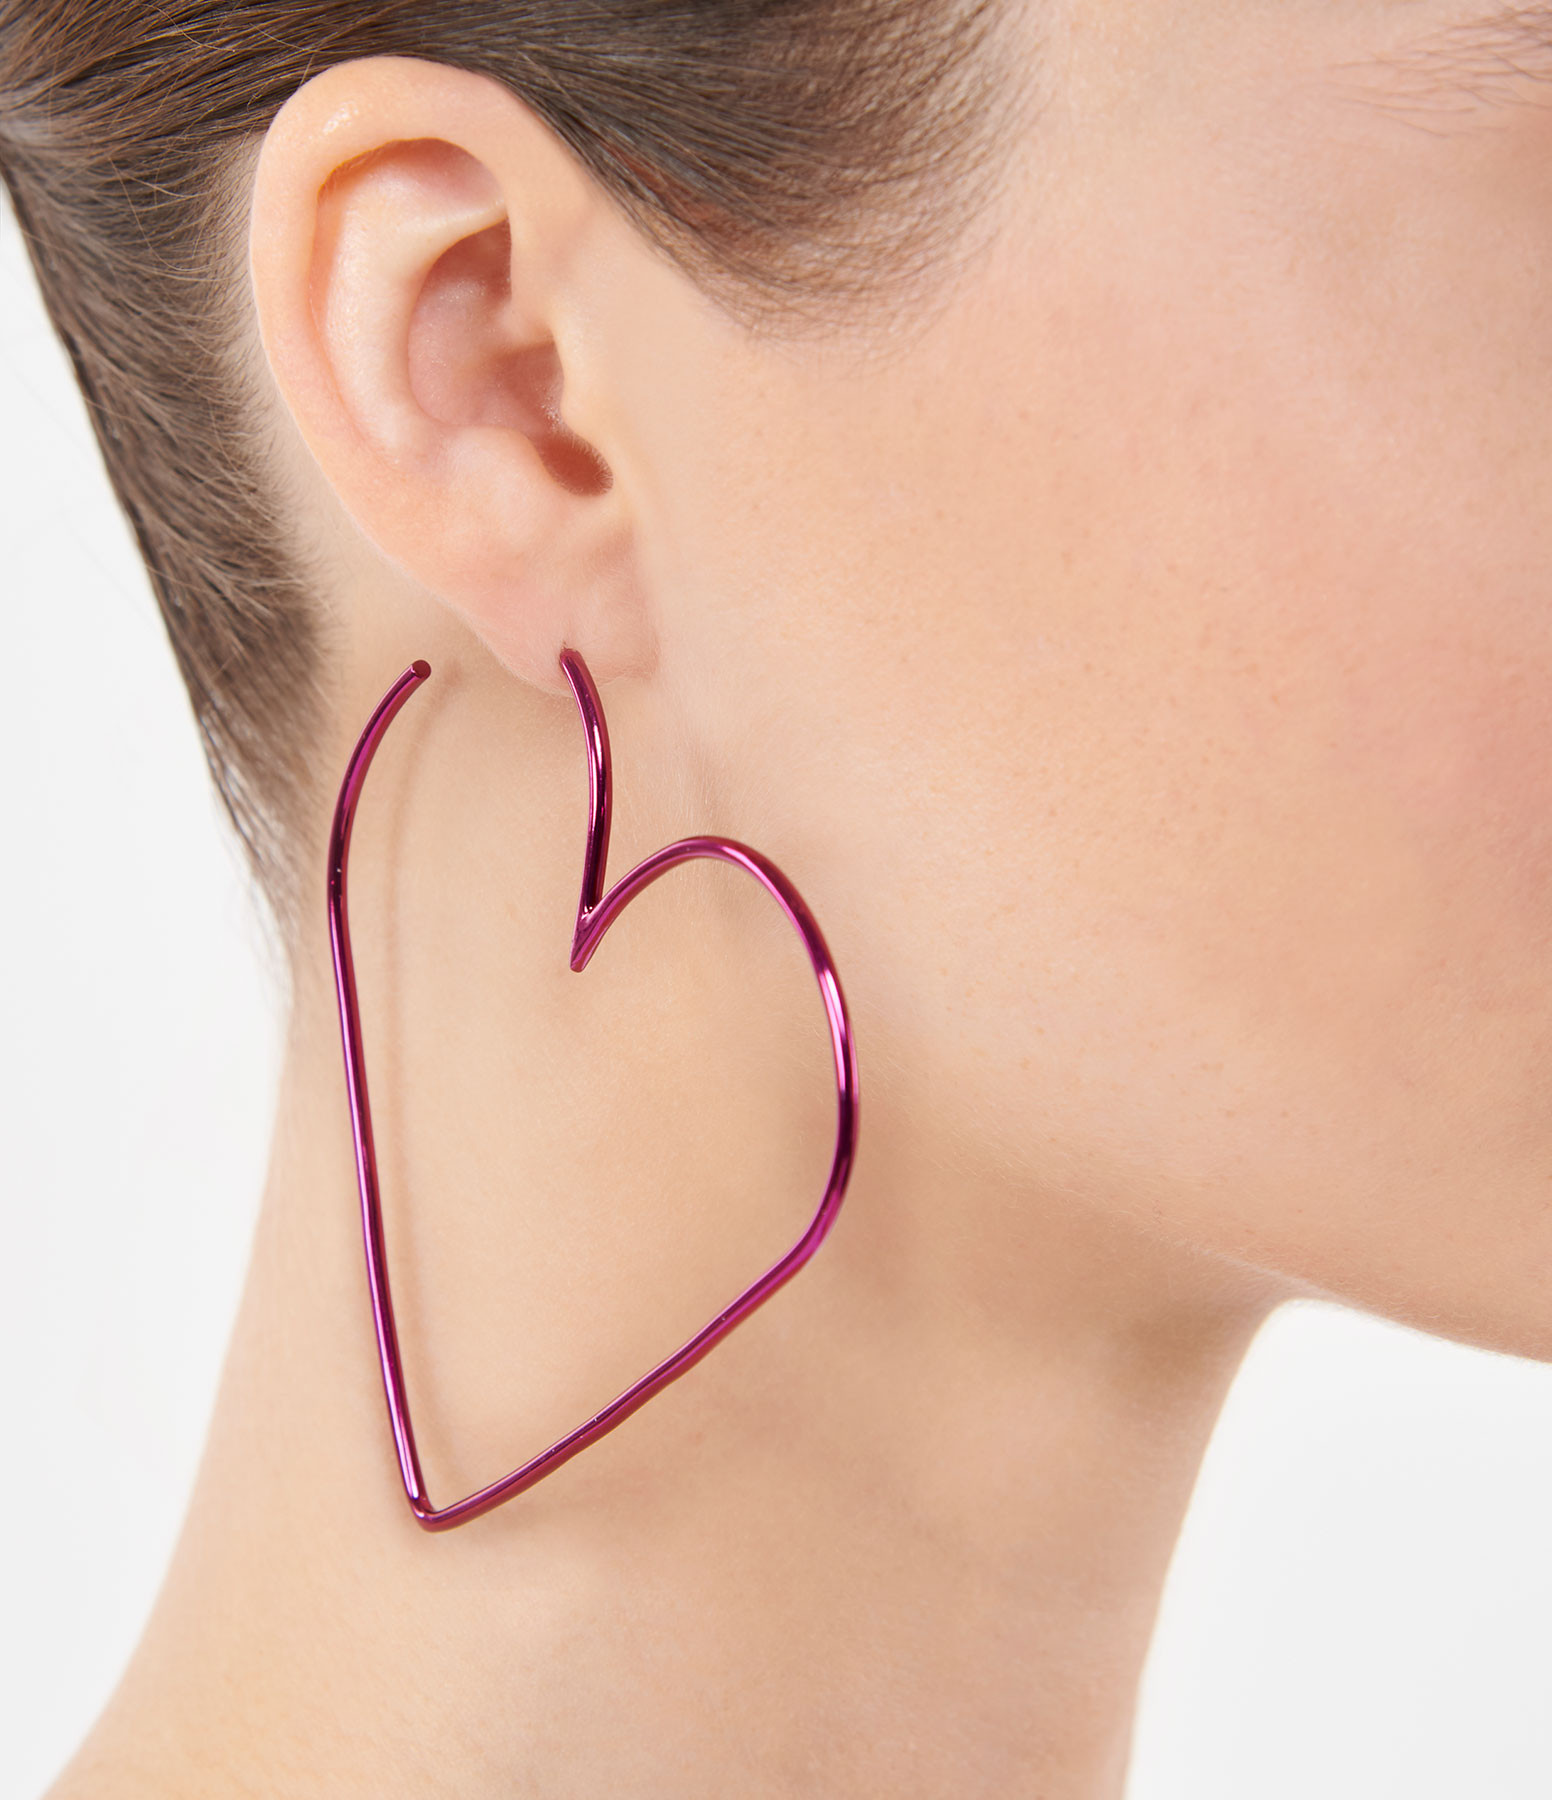 ISABEL MARANT - Boucles d'oreilles In Love Laiton Fushia